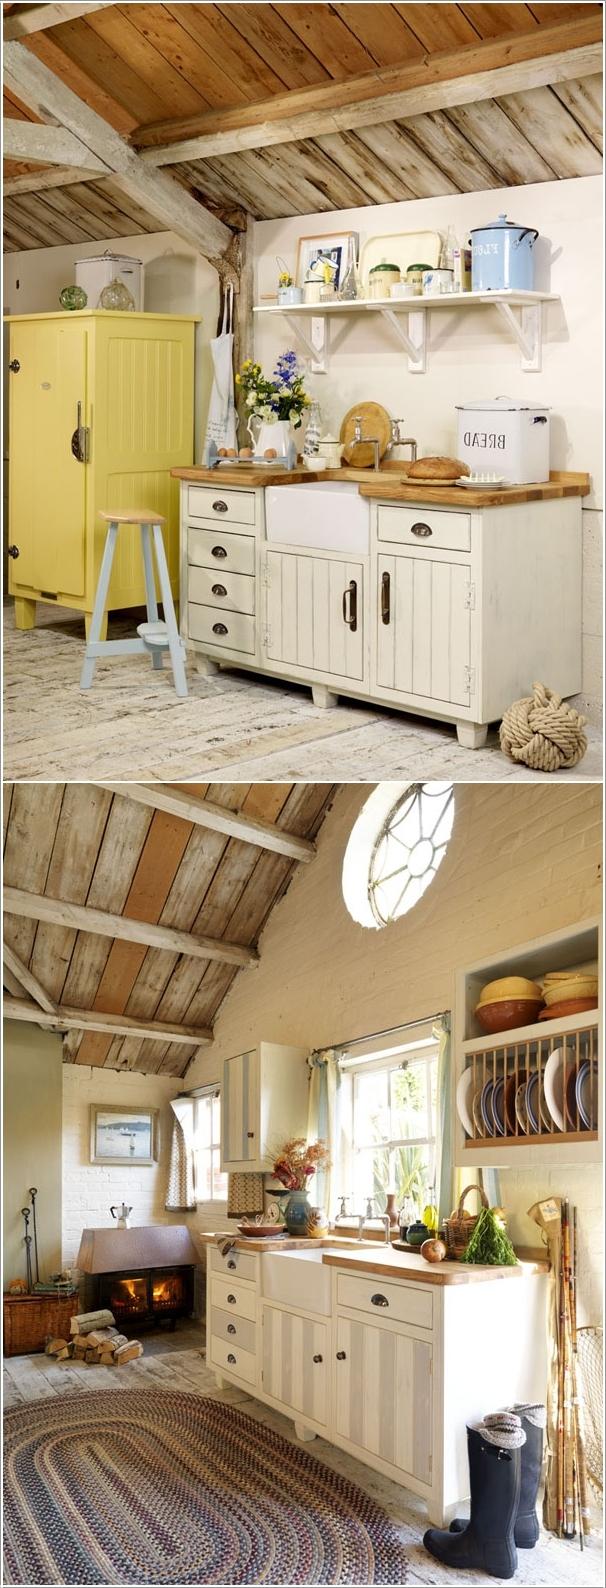 15 Inspiring Warm And Cozy Kitchen Designs A Interior Design